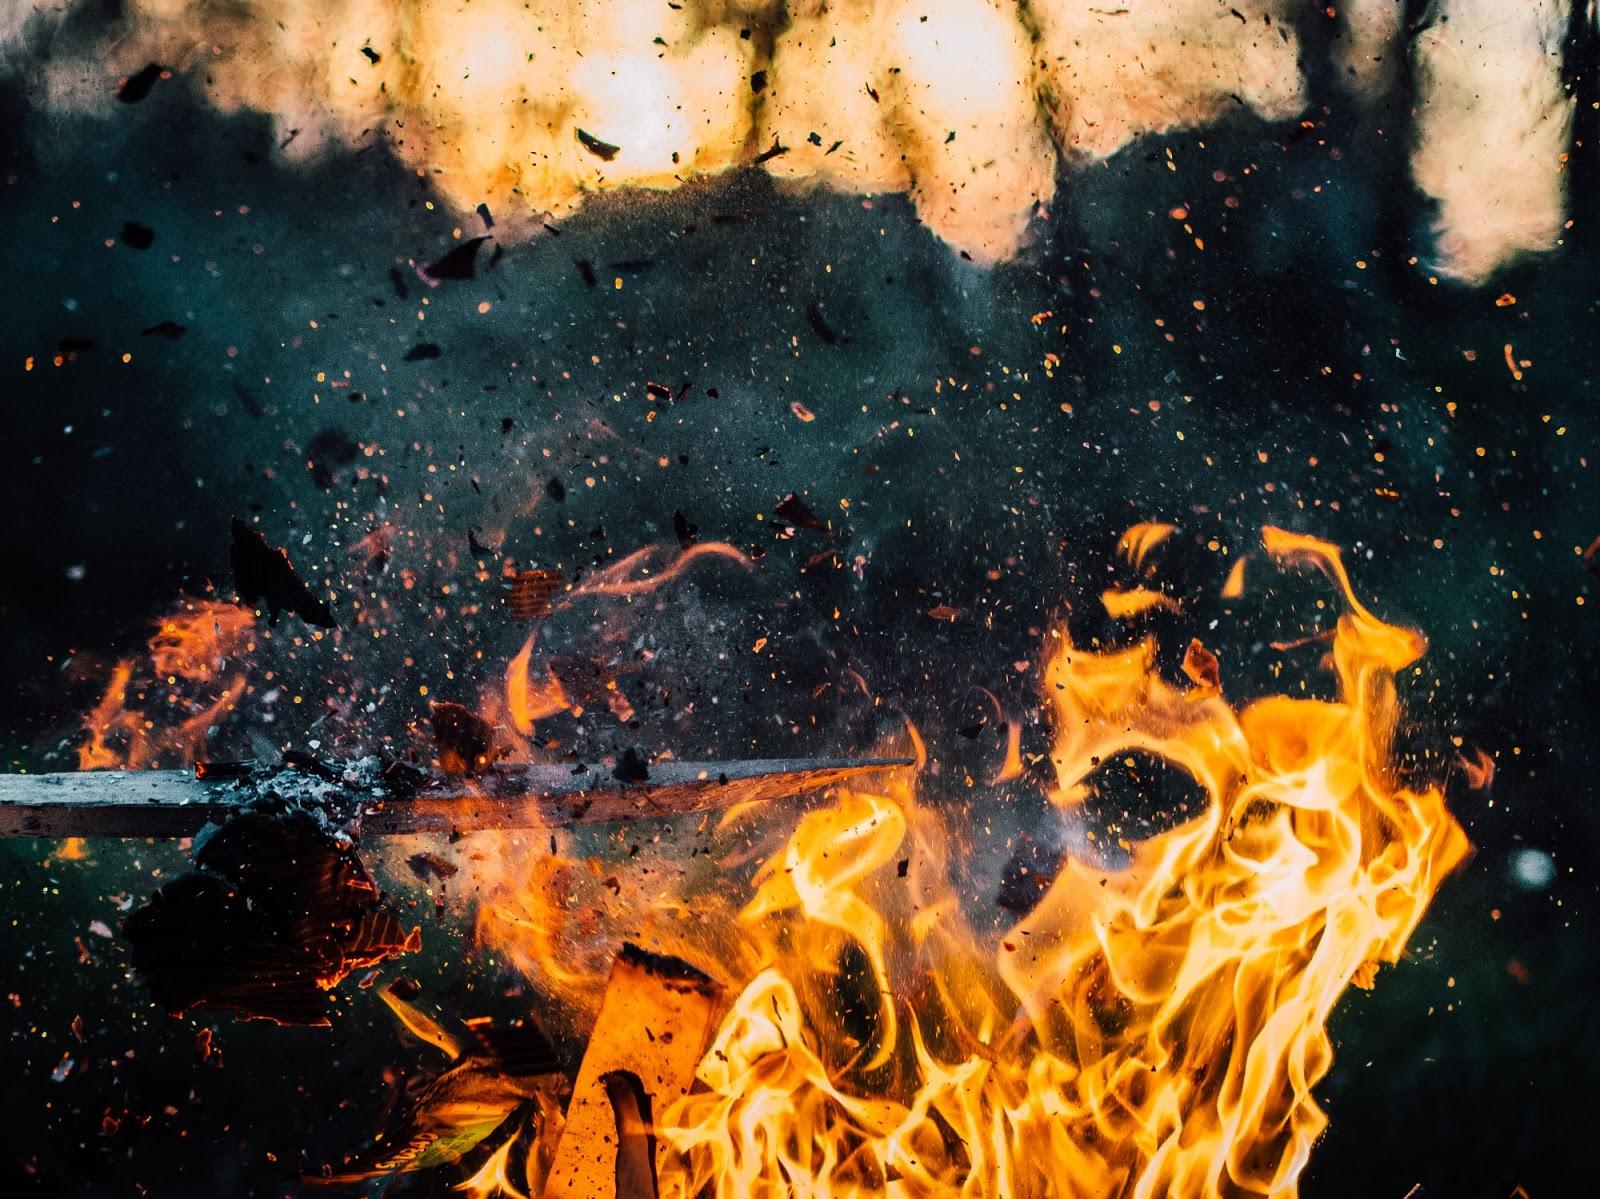 rozpal ogien namietnosci